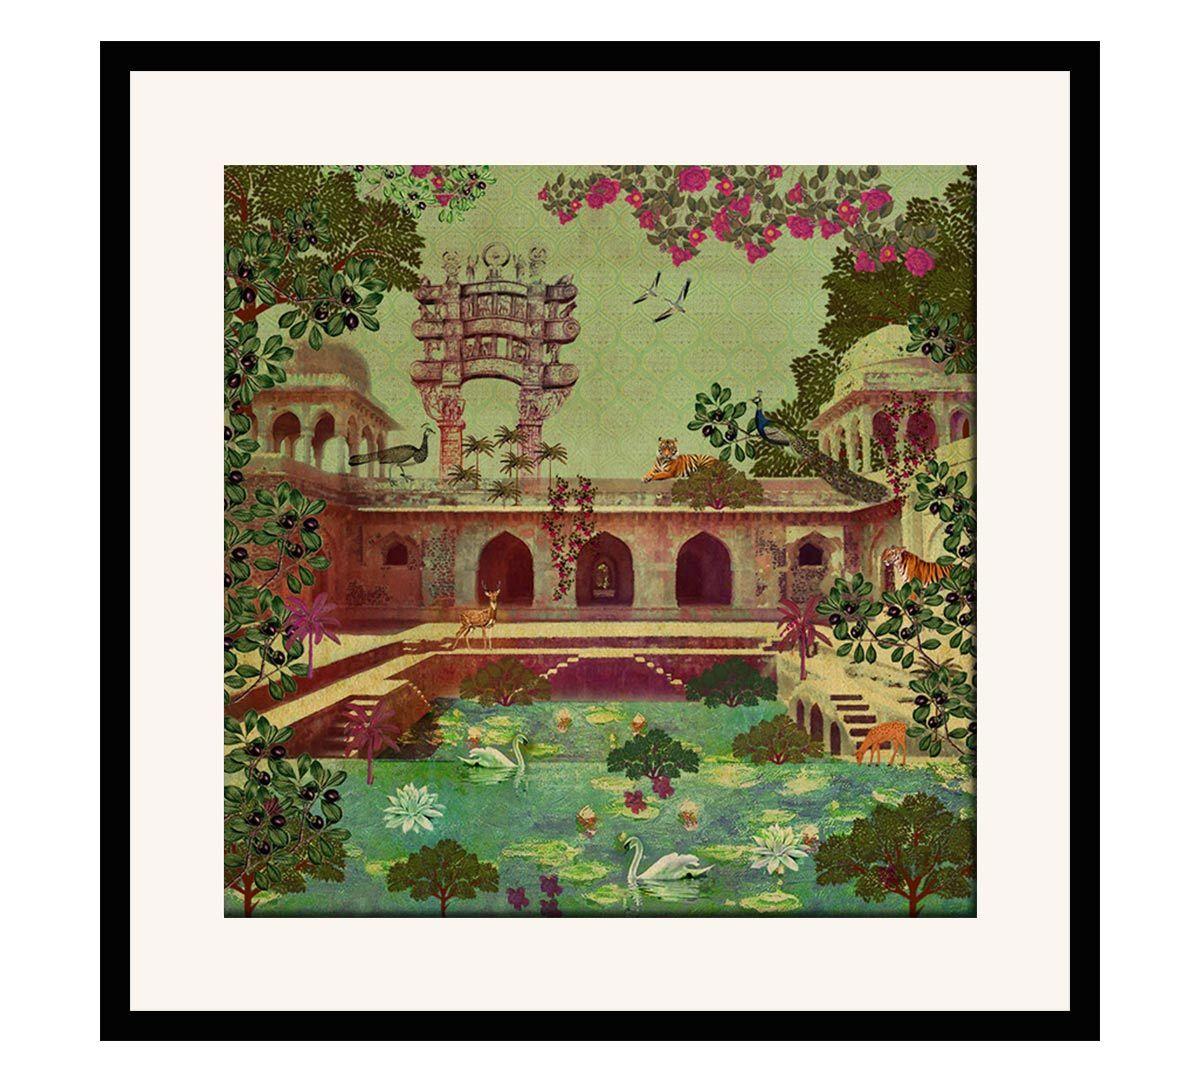 India Circus Mammalian Picnic 16 x 16 and 24 x 24 Framed Wall Art